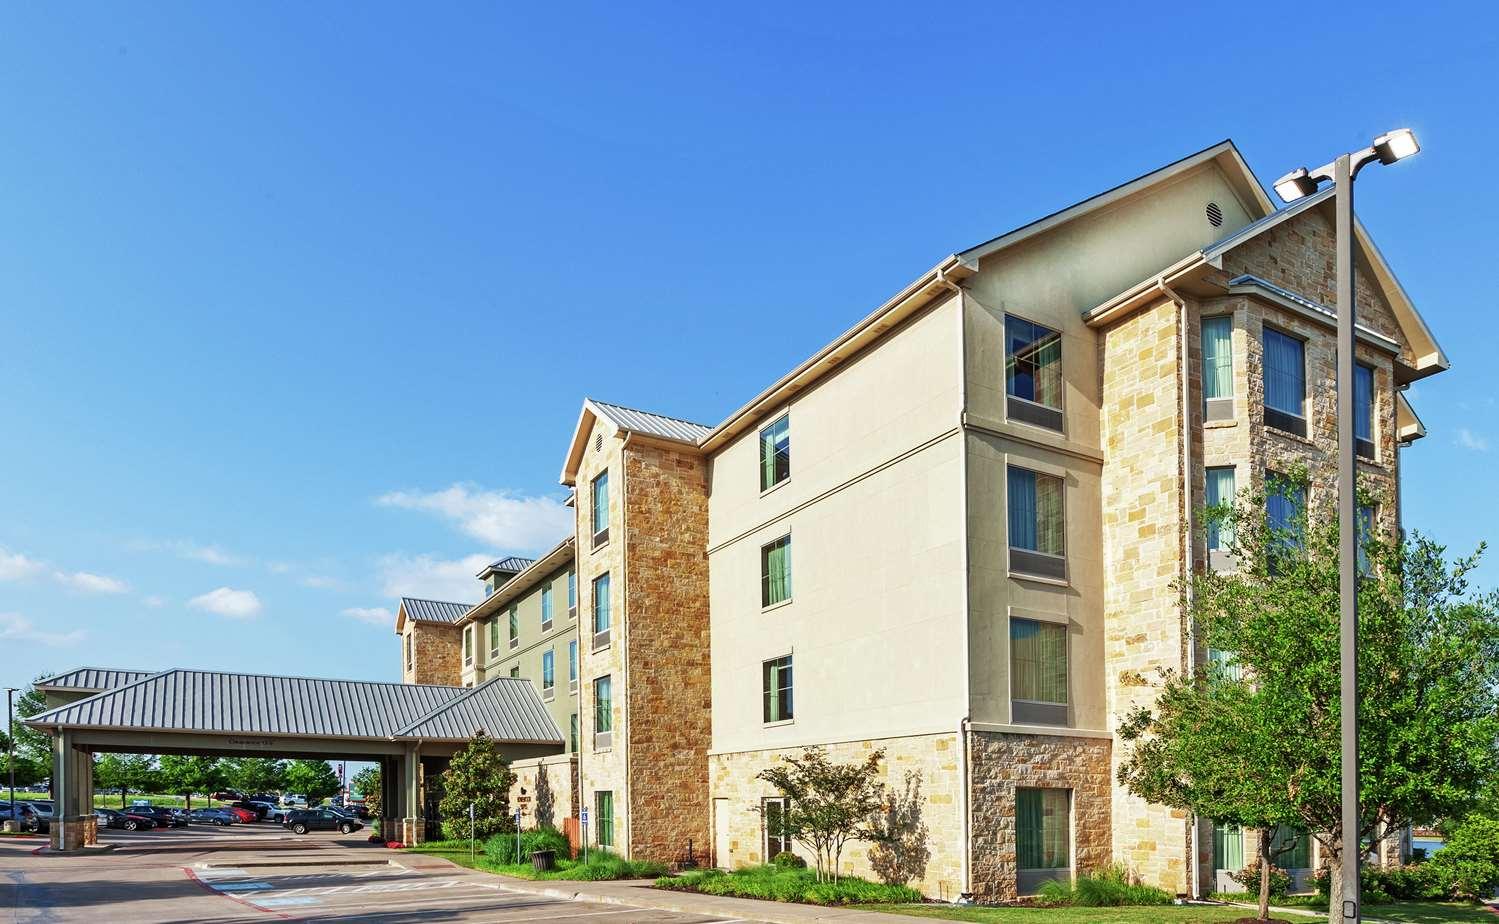 Homewood Suites by Hilton Waco Texas